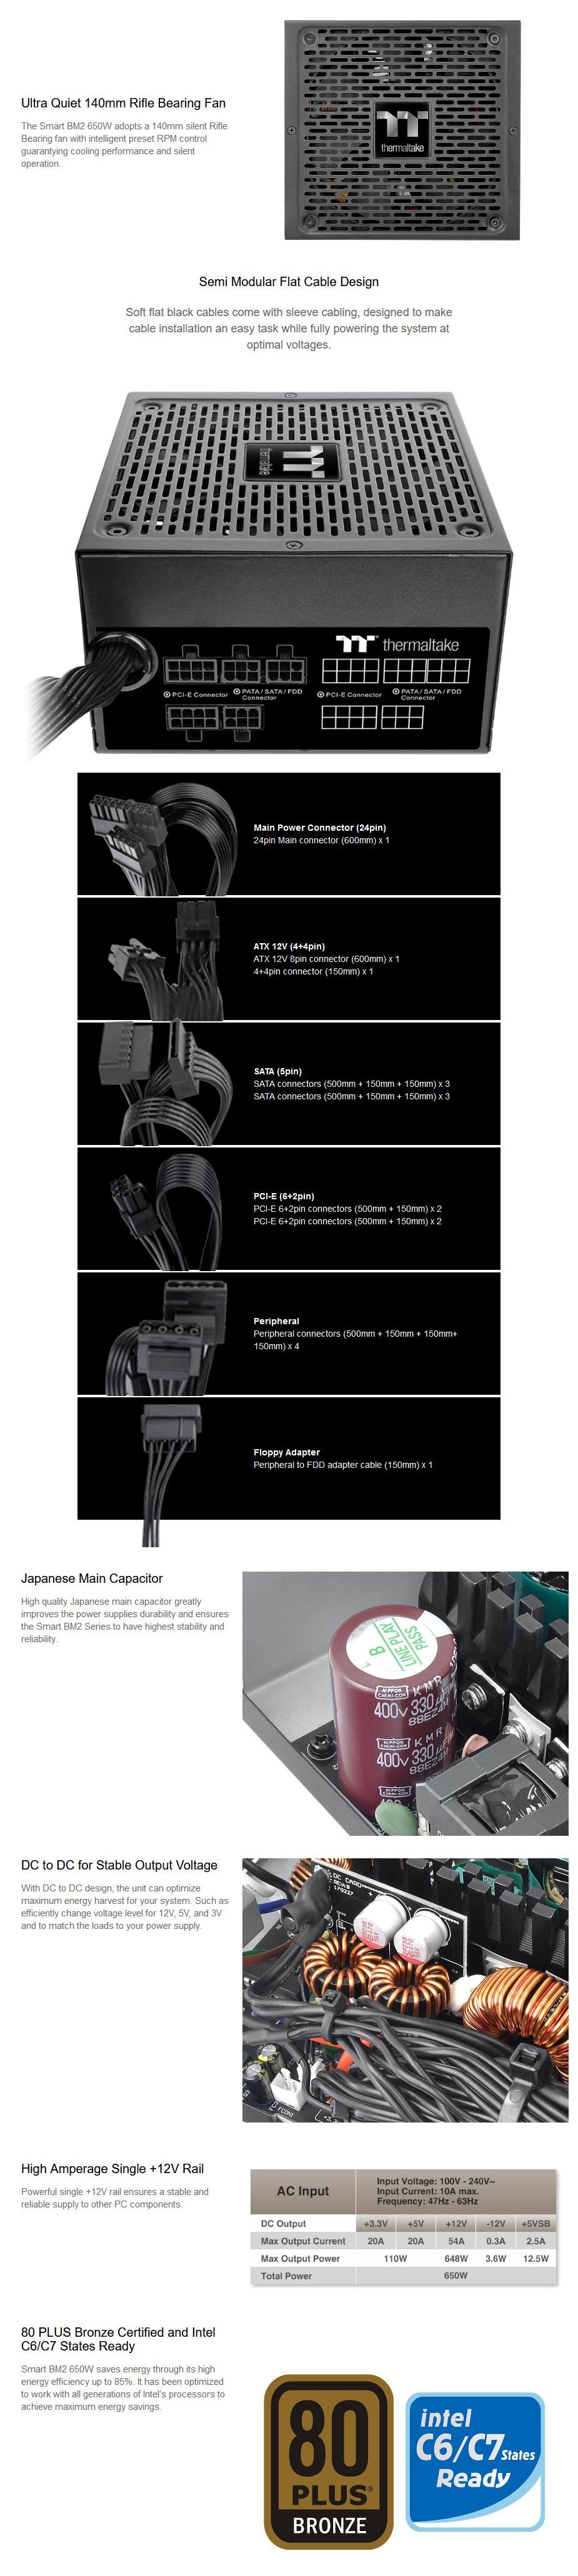 Thermaltake Smart BM2 Series 650W 80+ Bronze Semi-Modular Power Supply - Overview 1